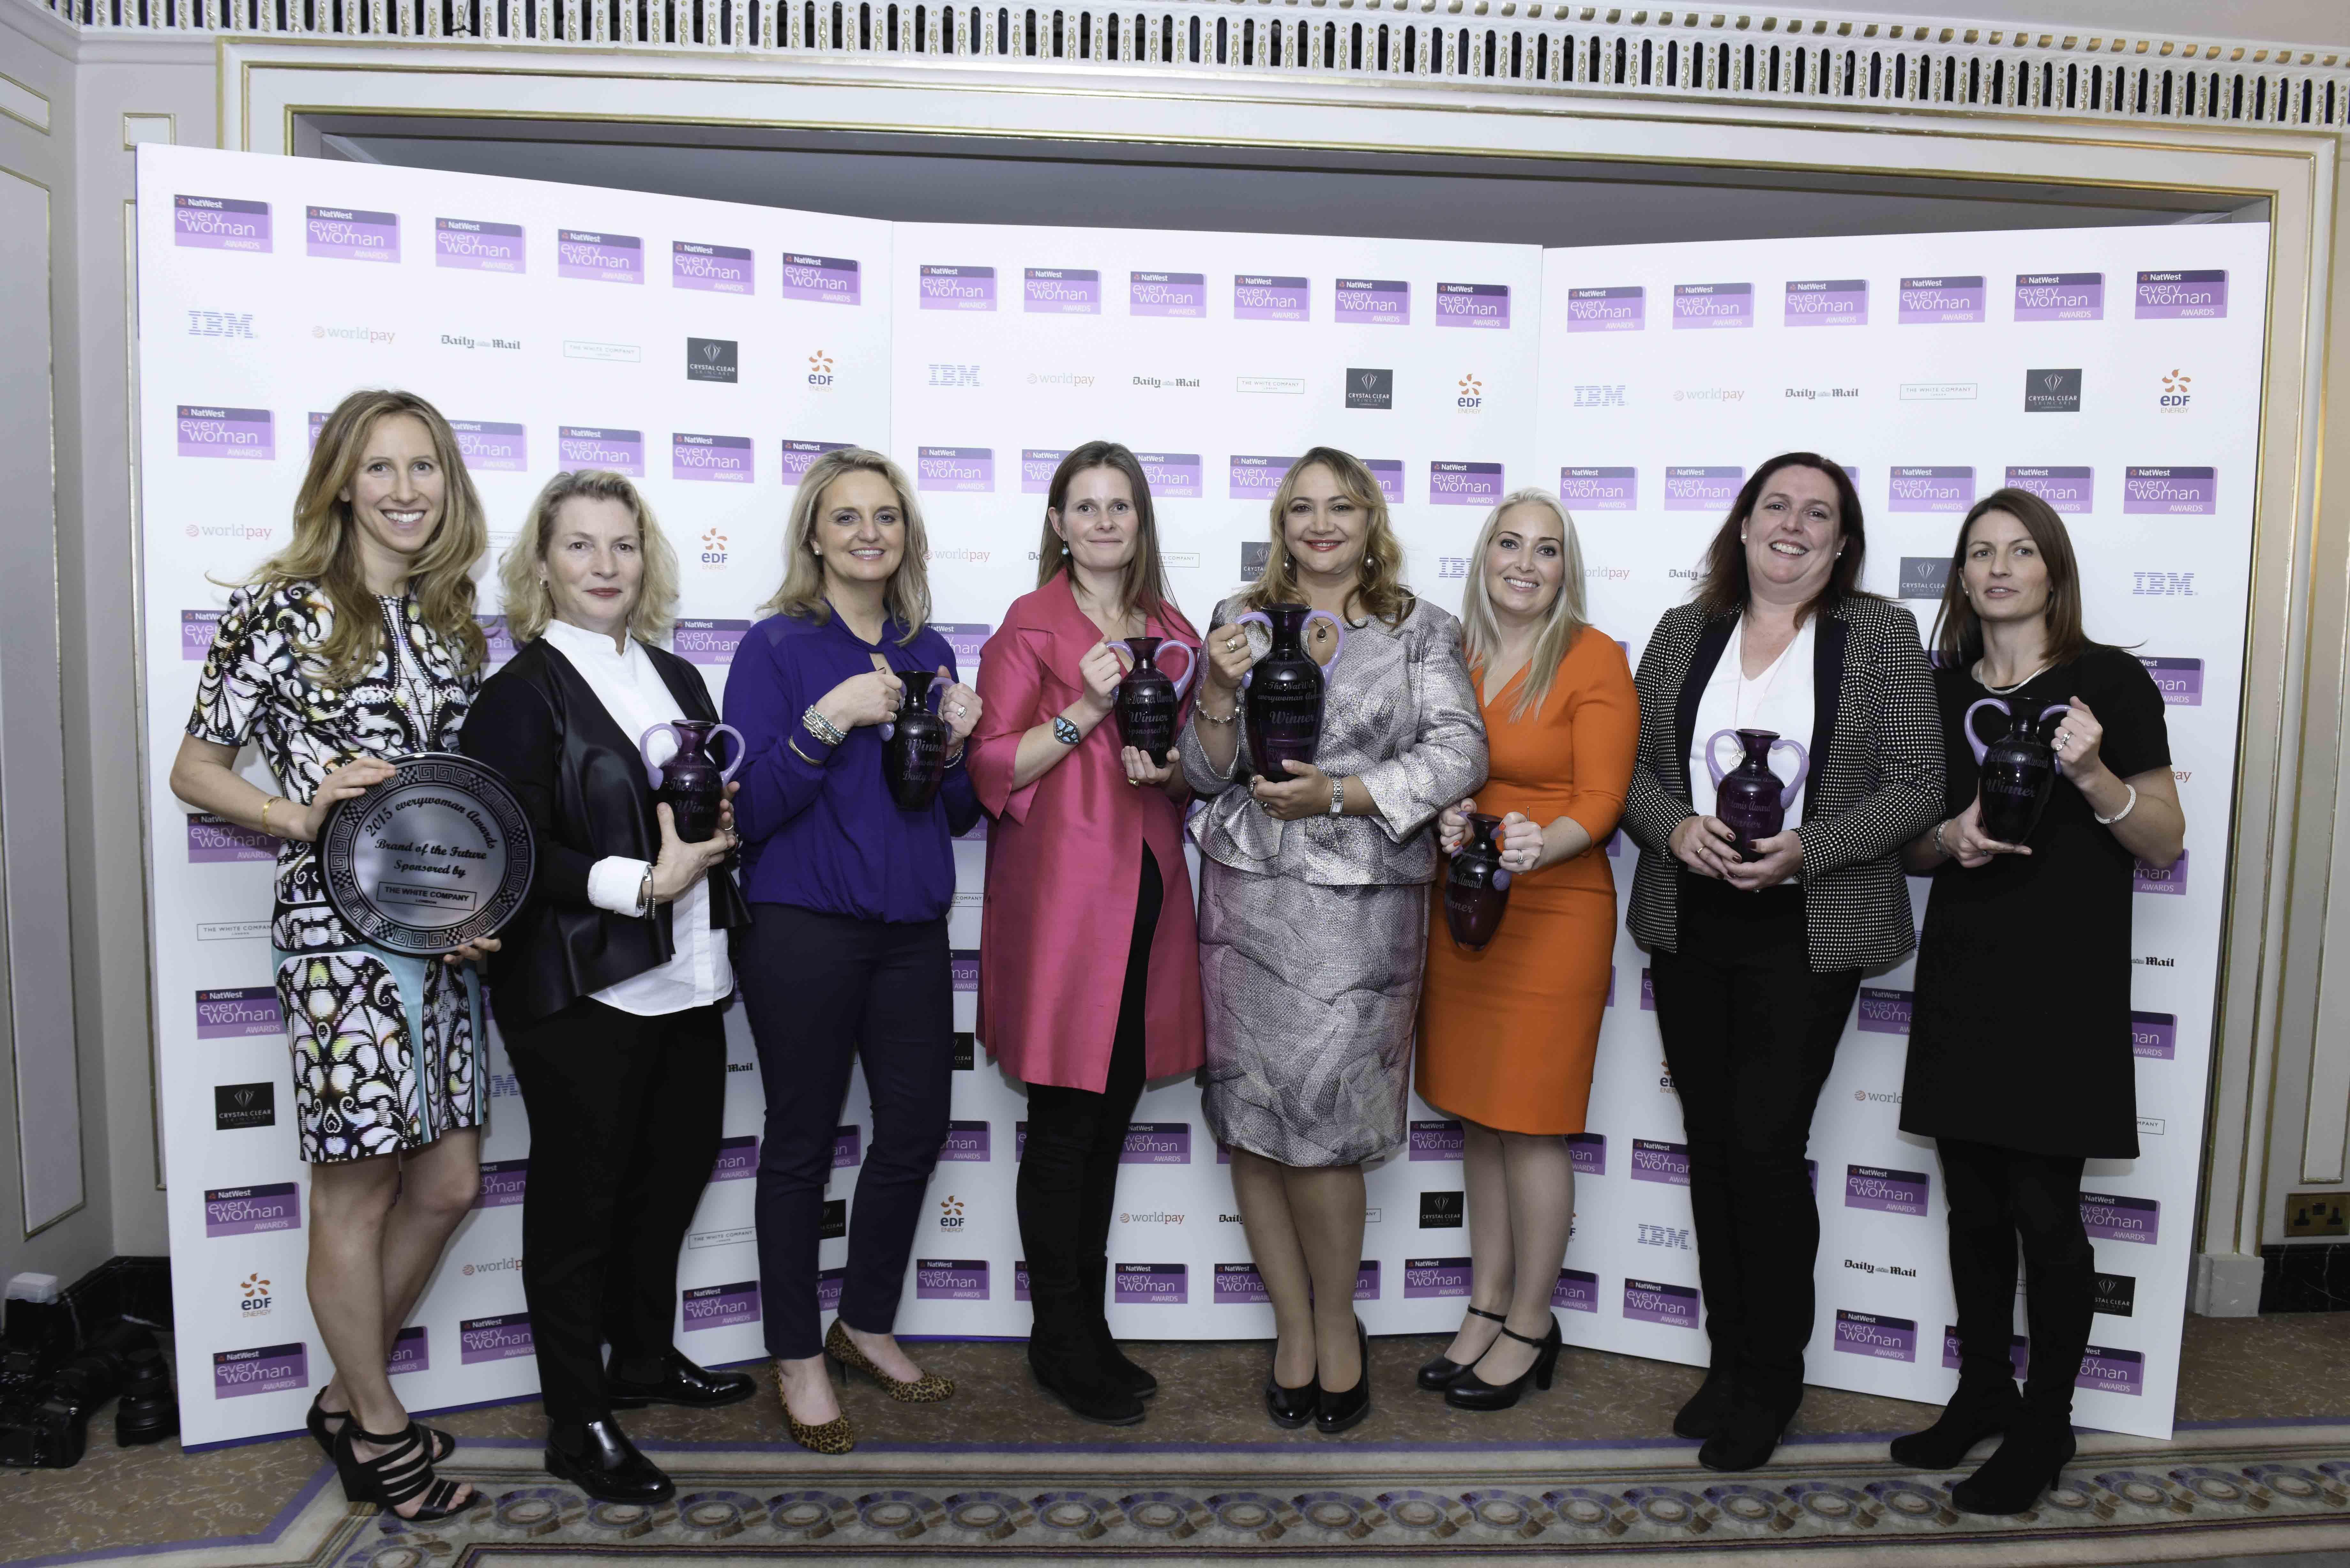 Finalists announced in 2016 NatWest everywoman Awards - UKTN (UK Tech News) 81de96654